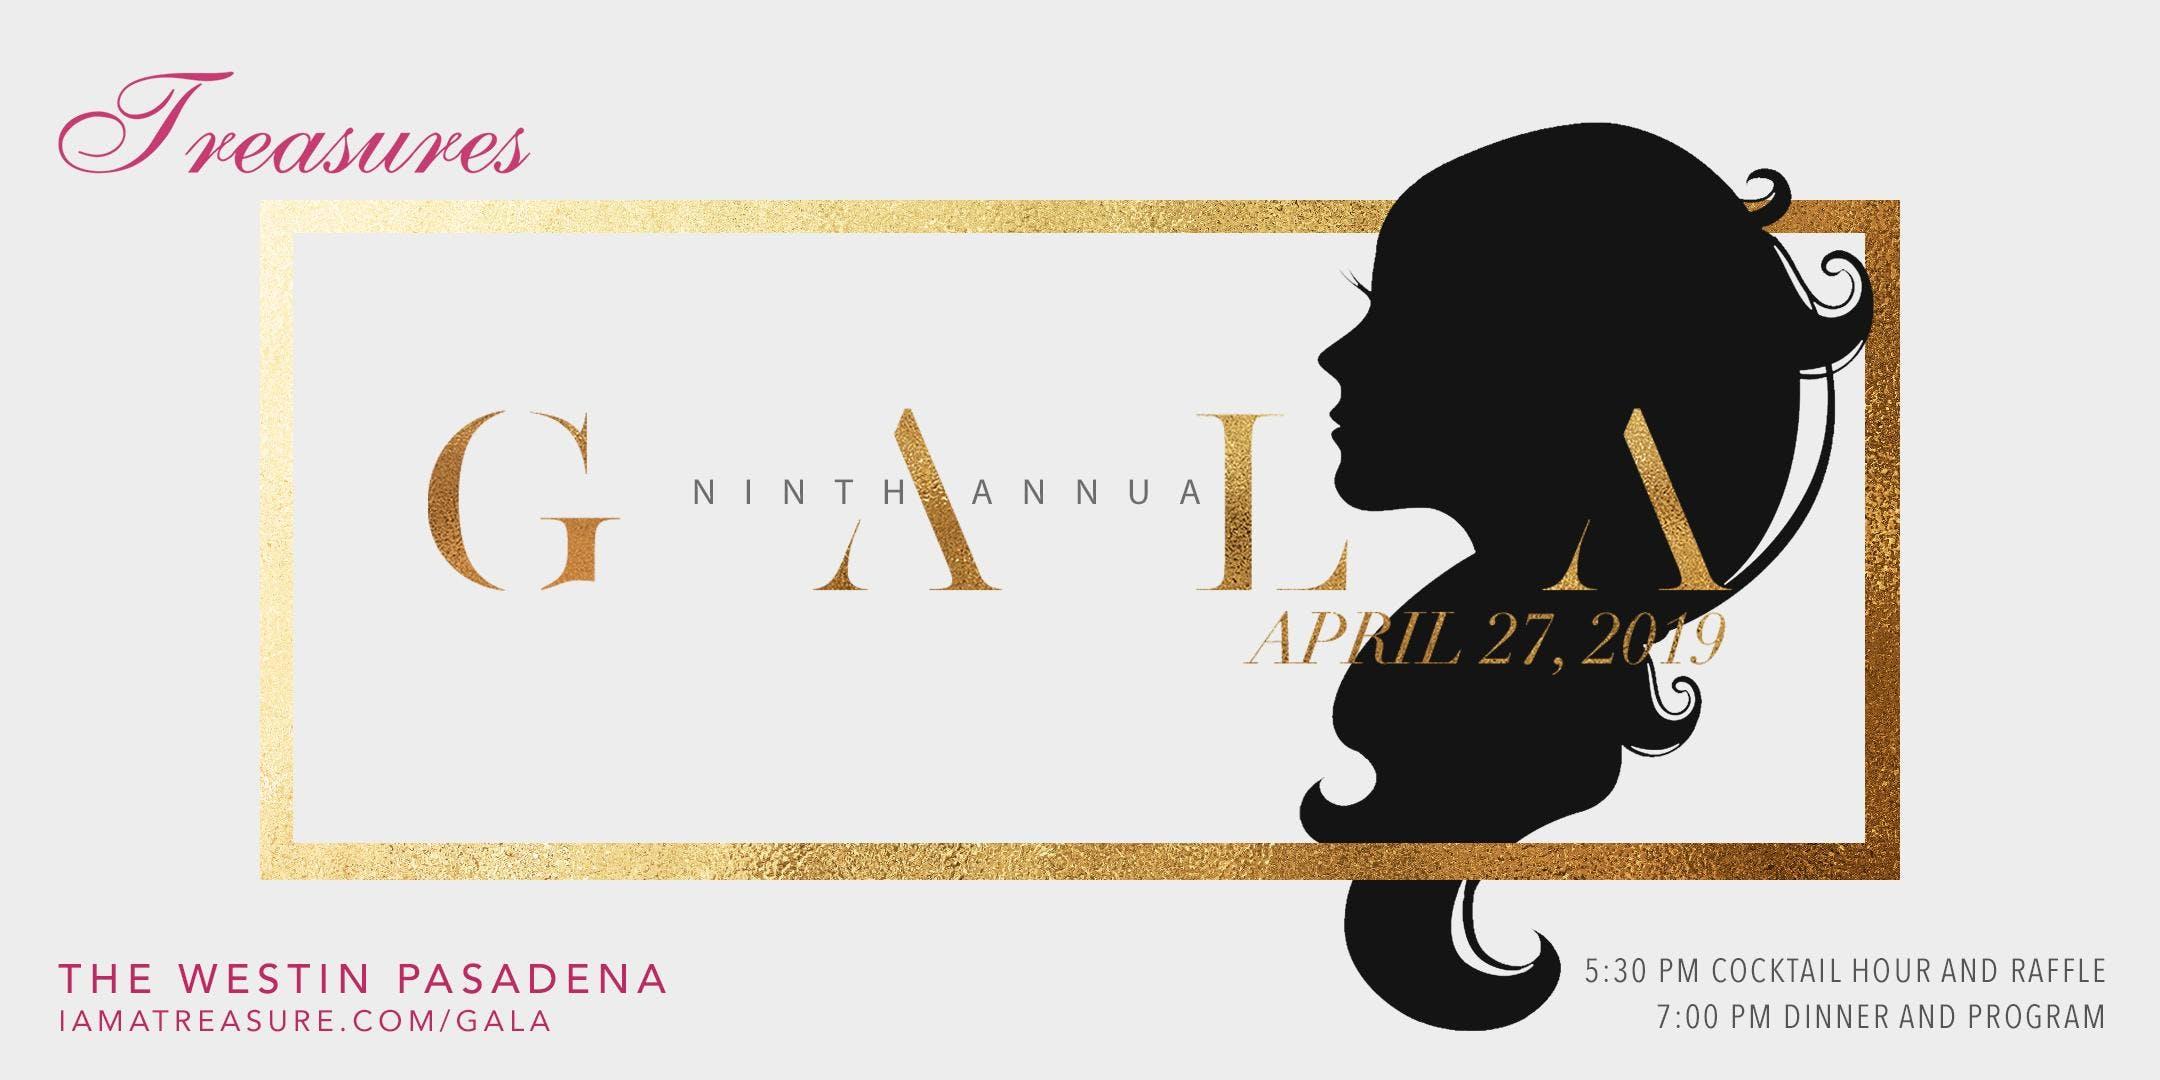 Treasures 9th Annual Gala